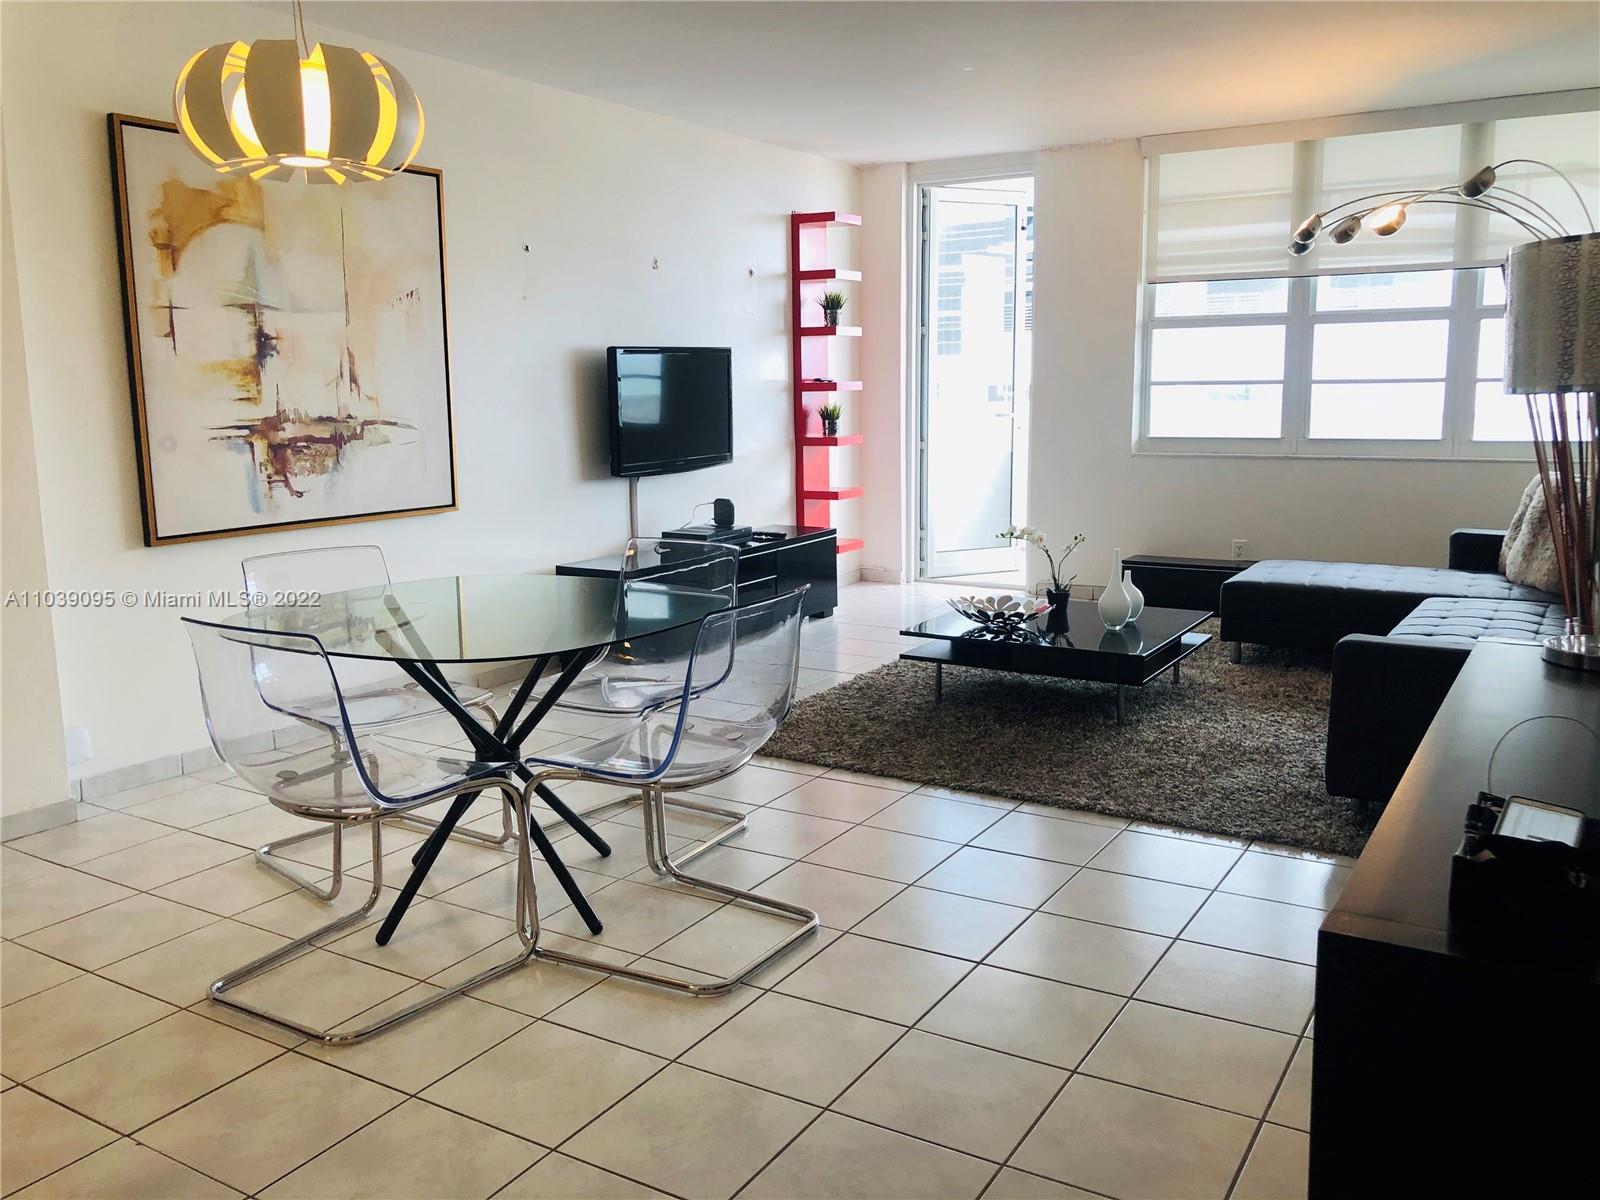 Decoplage #933 - 100 Lincoln Rd #933, Miami Beach, FL 33139